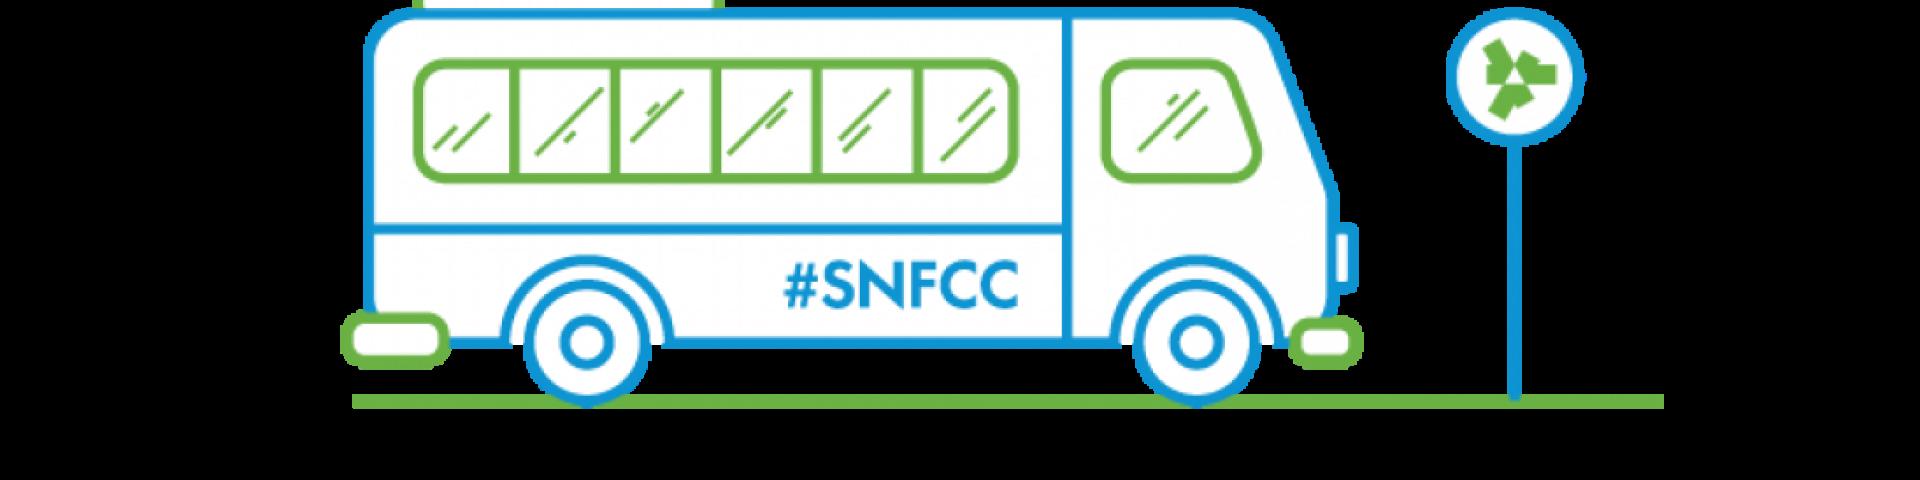 SNFCC shuttle bus suspension - Εικόνα